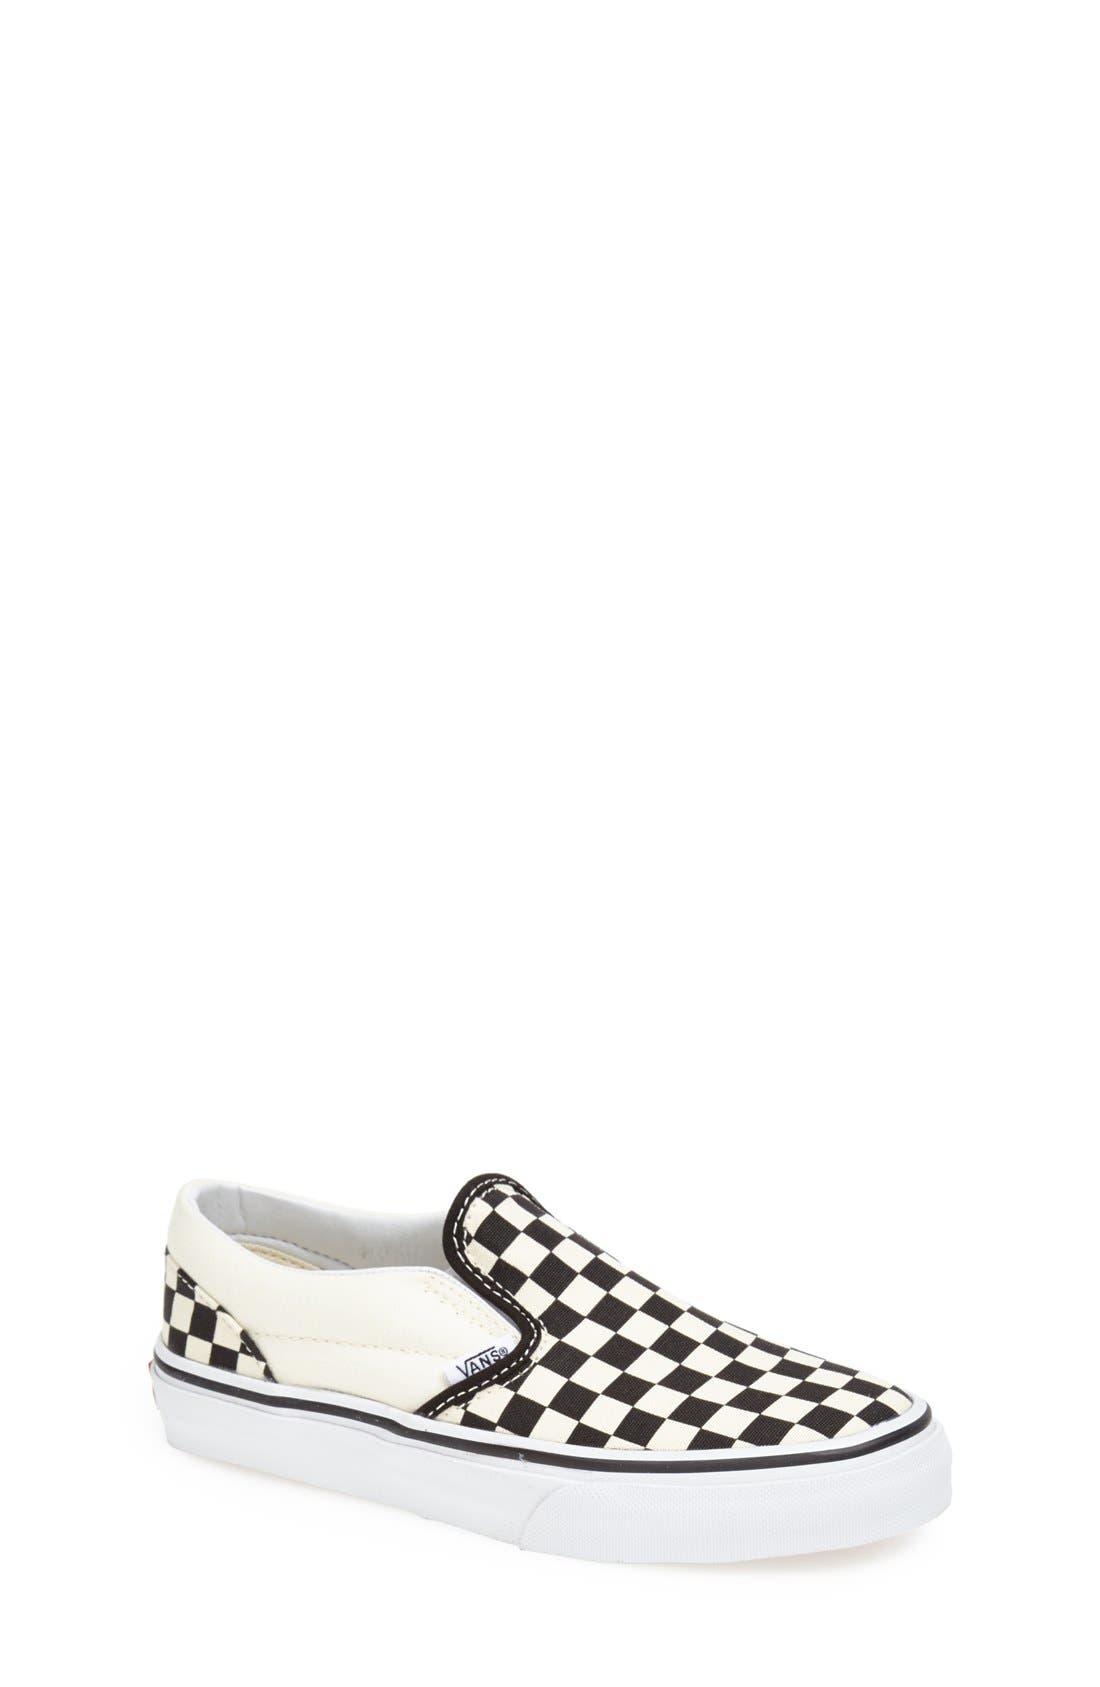 'Classic - Checkerboard' Slip-On,                             Main thumbnail 1, color,                             BLACK/ WHITE CHECKERBOARD